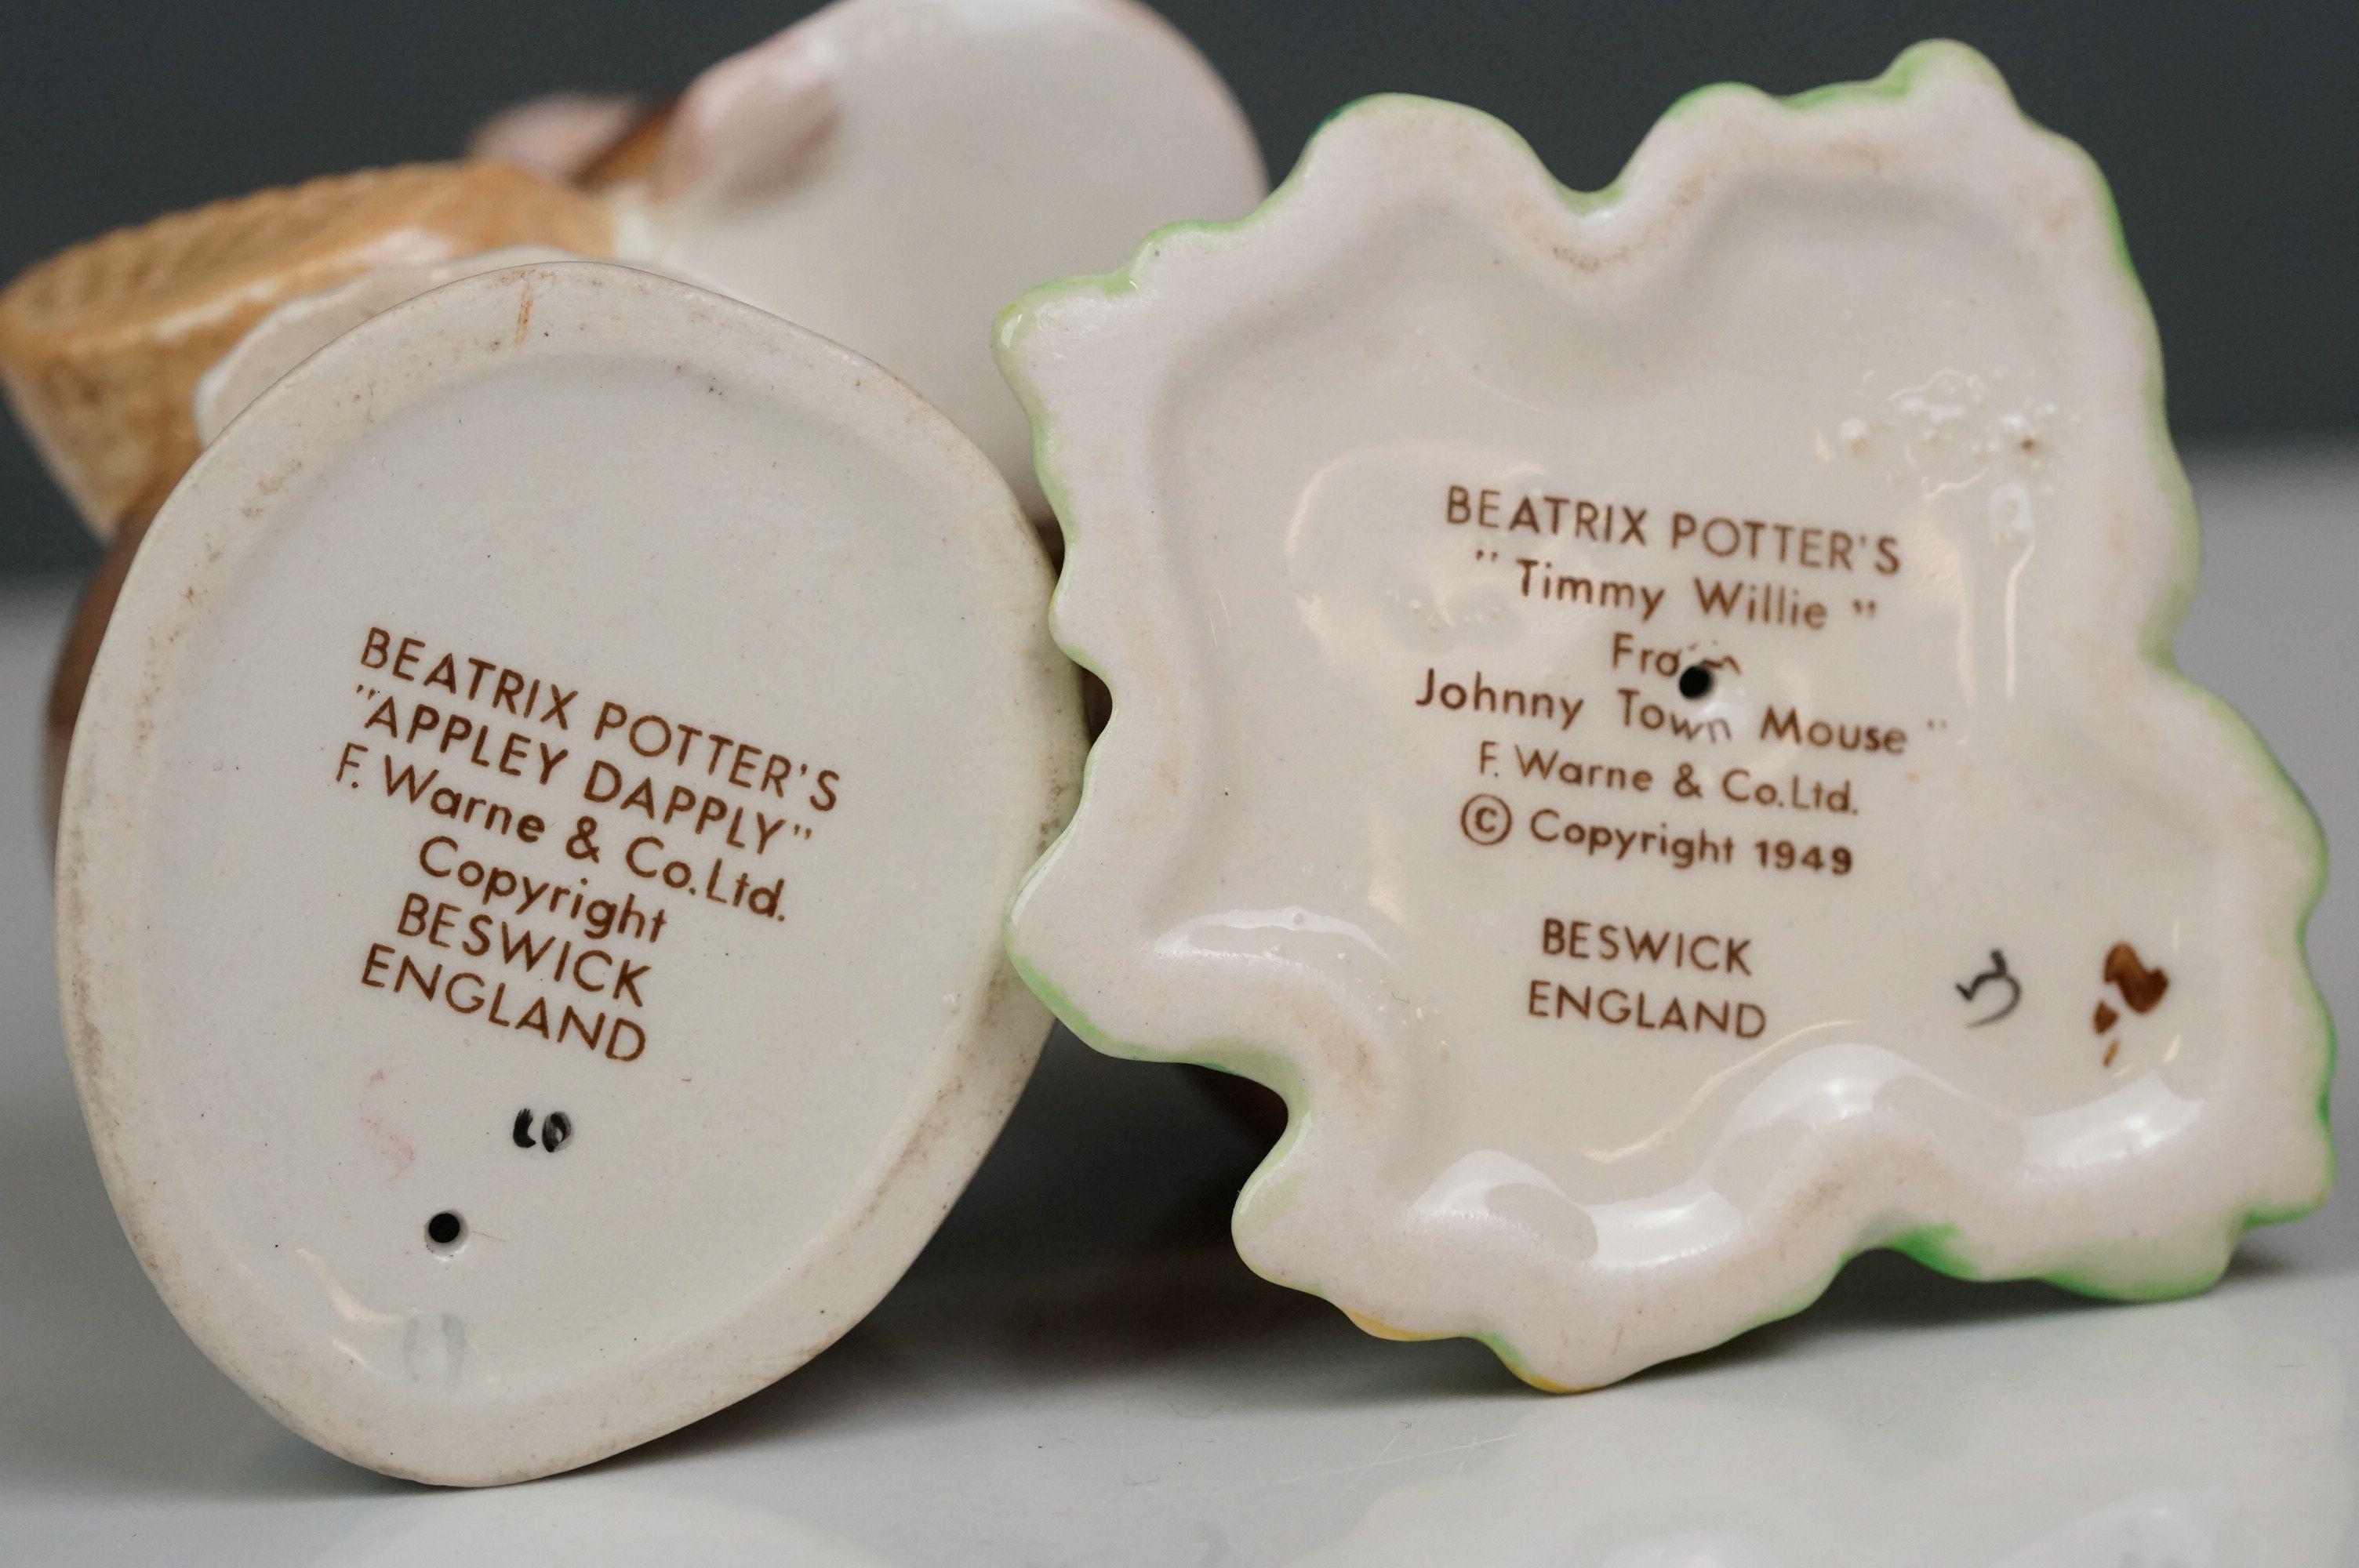 Eight Beswick Beatrix Potter figures comprising Appley Dapply; Timmy Willie; Peter Rabbit; Samuel - Image 4 of 13